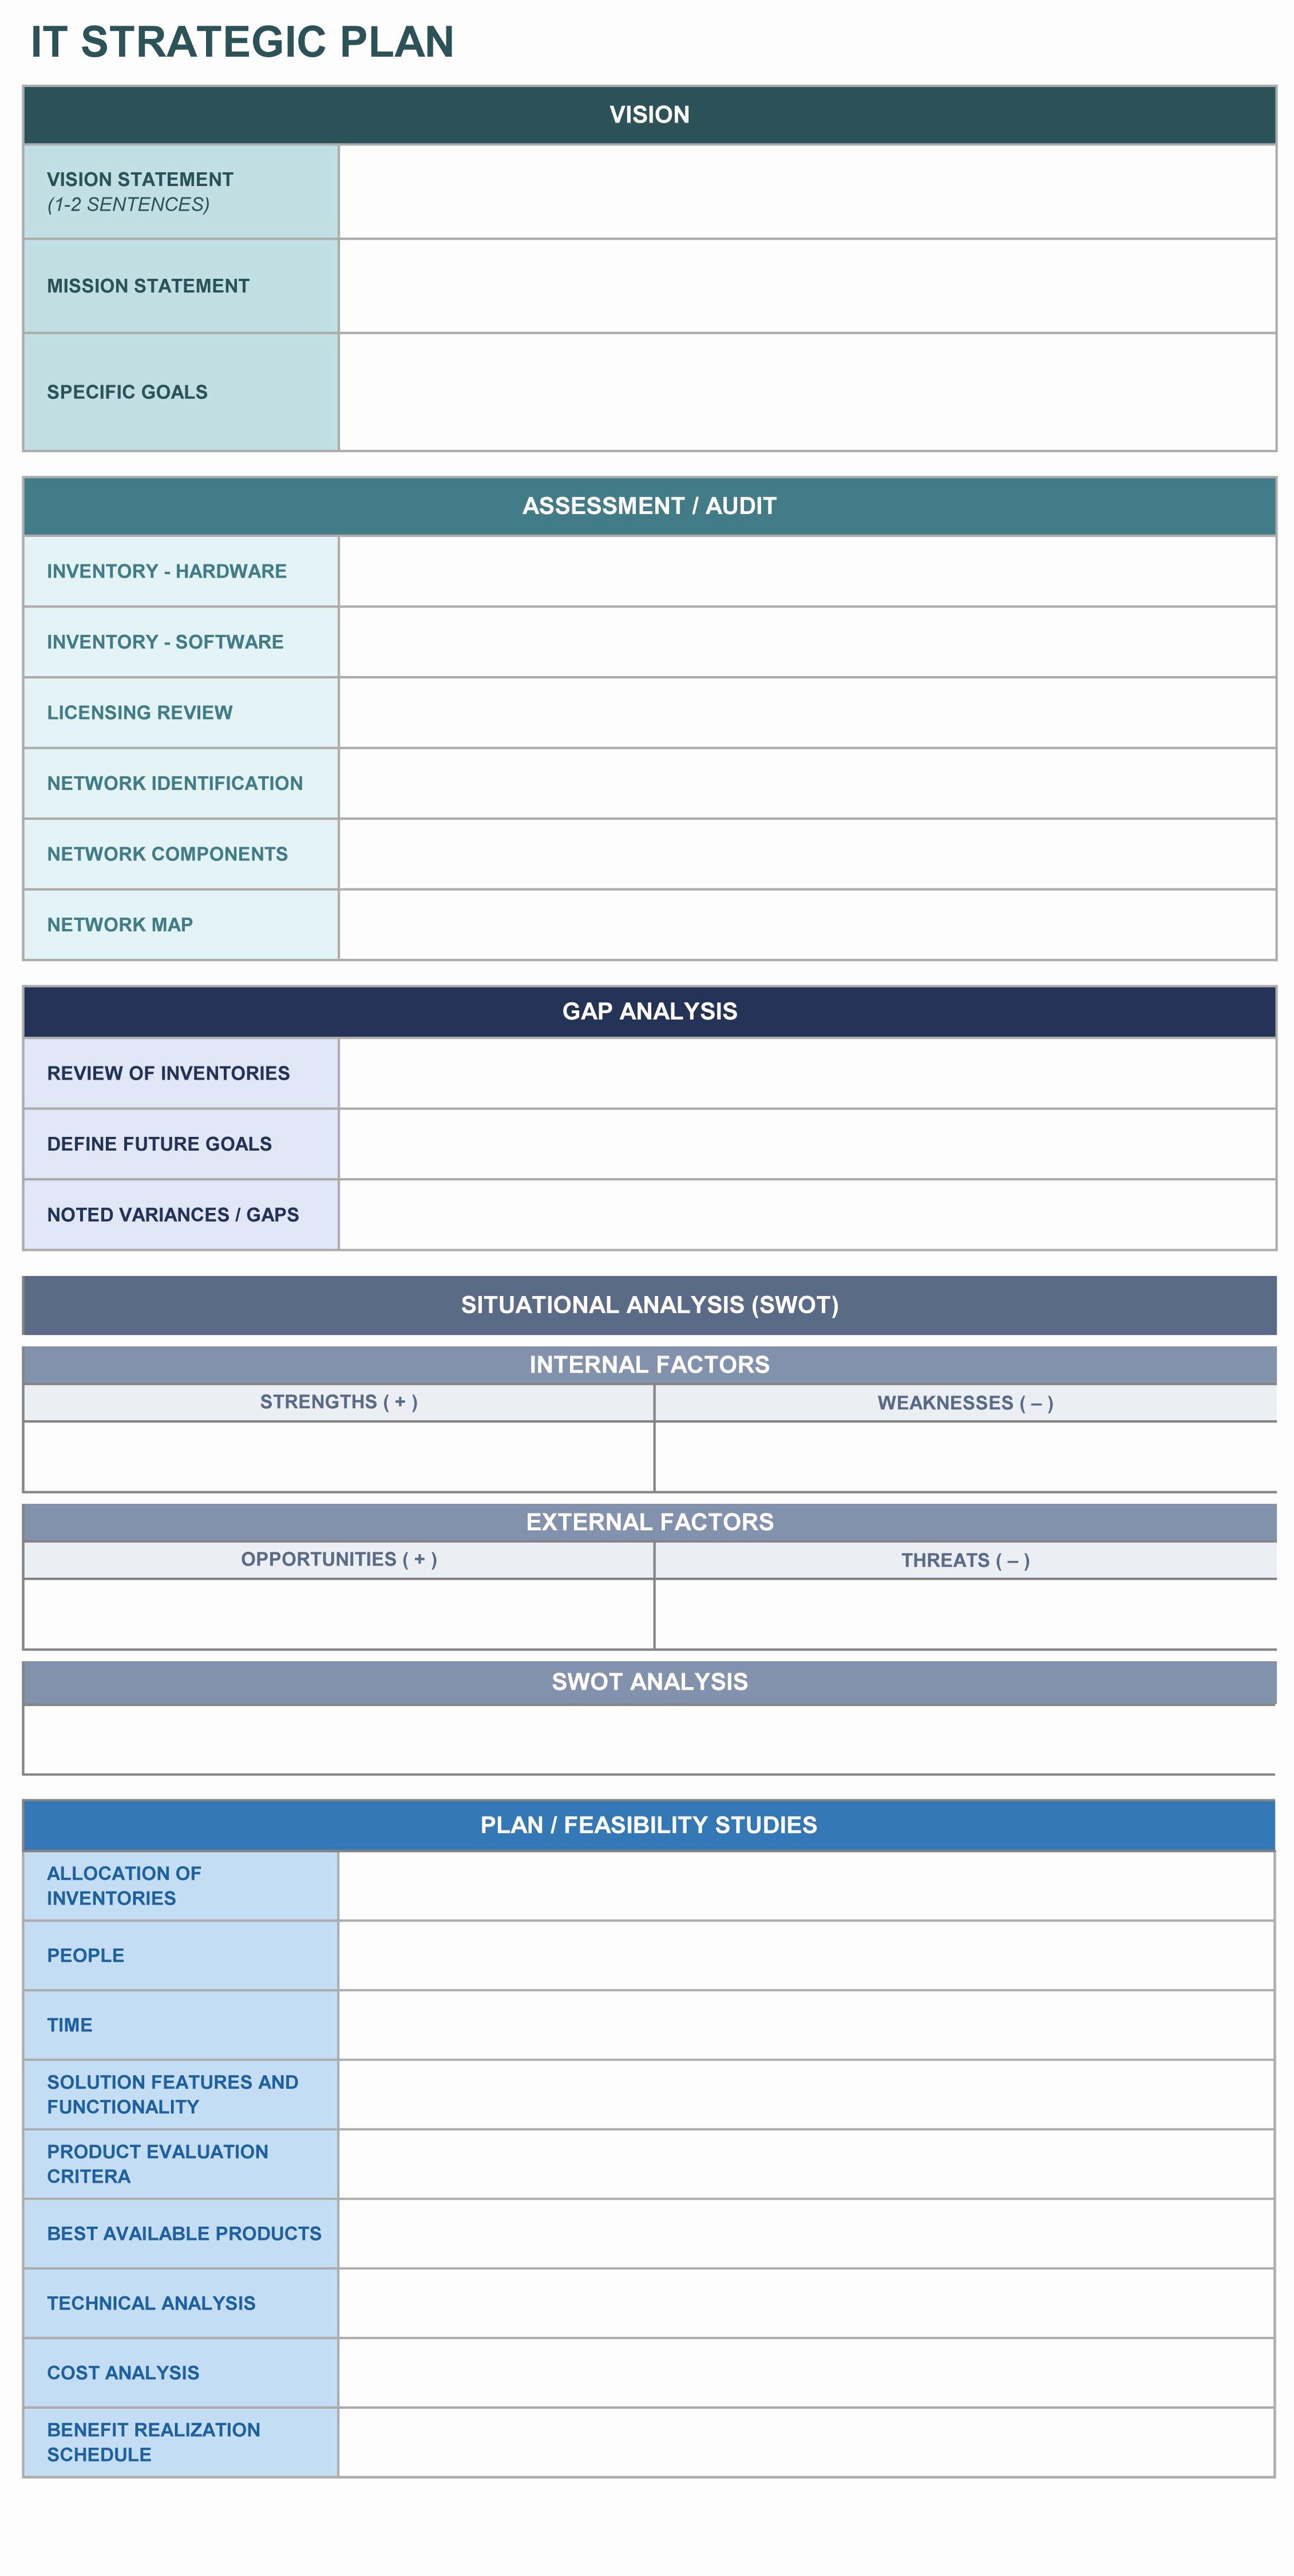 Strategic Plan Template Excel Lovely 9 Free Strategic Planning Templates Smartsheet